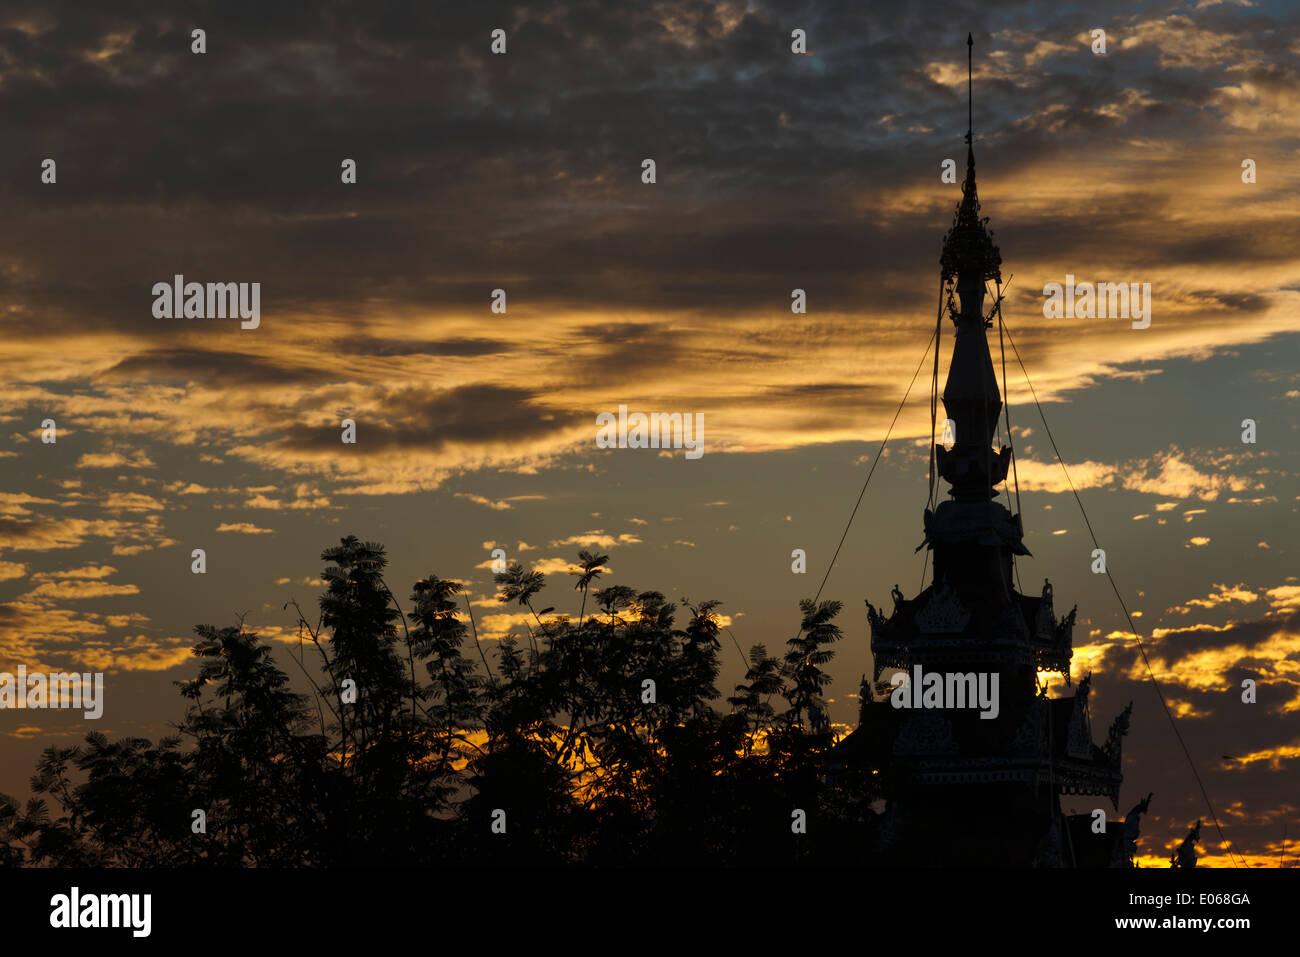 Sutaungpyei Pagoda on Mandalay Hill at sunset, Mandalay, Myanmar - Stock Image